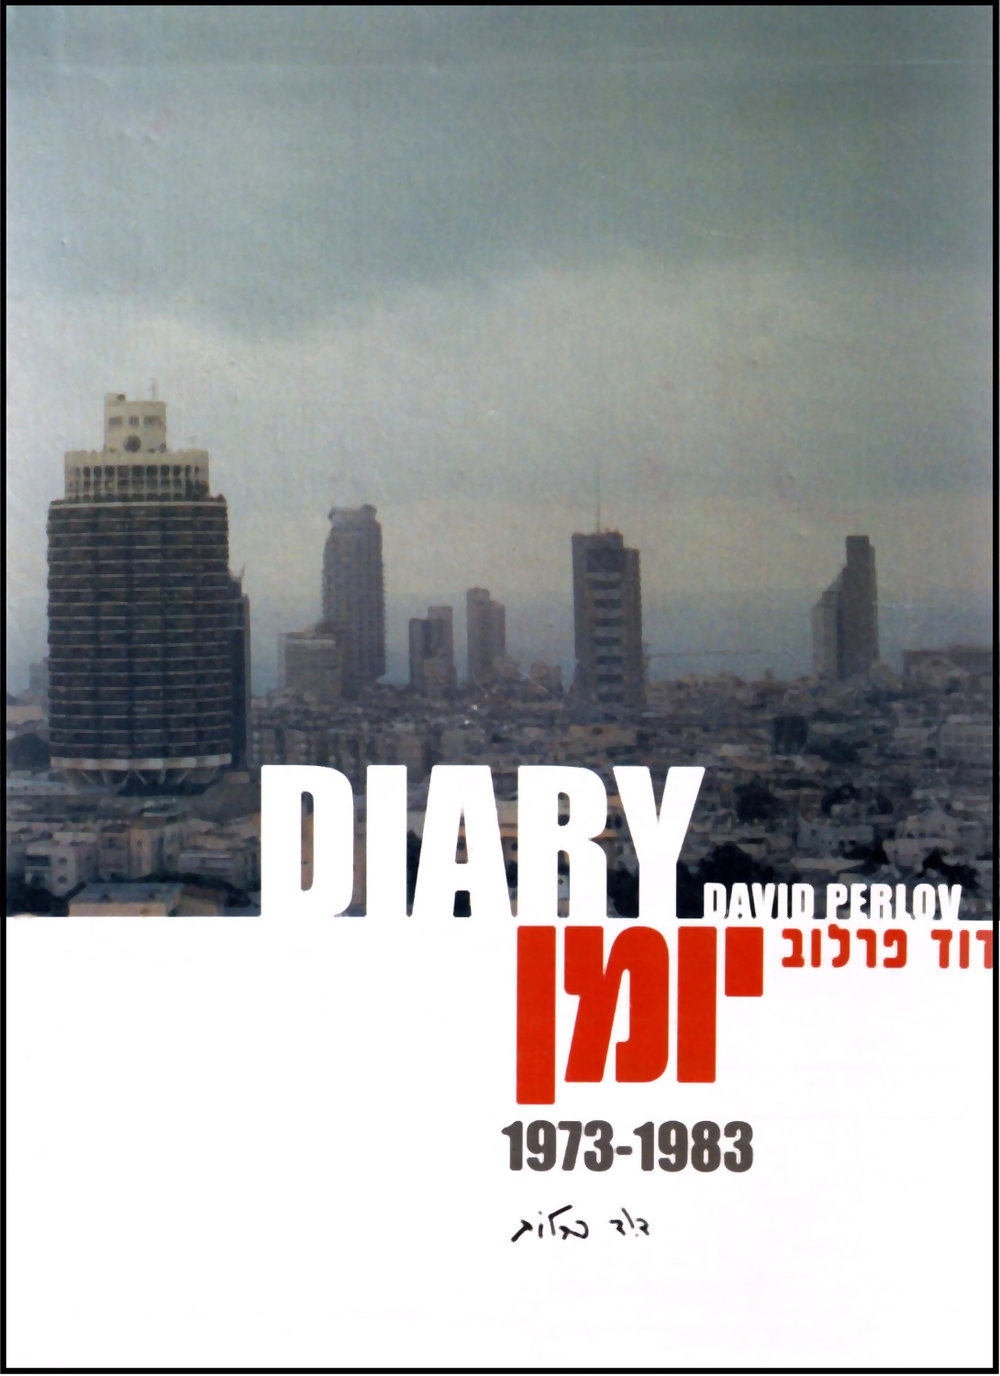 Diary cover.jpg